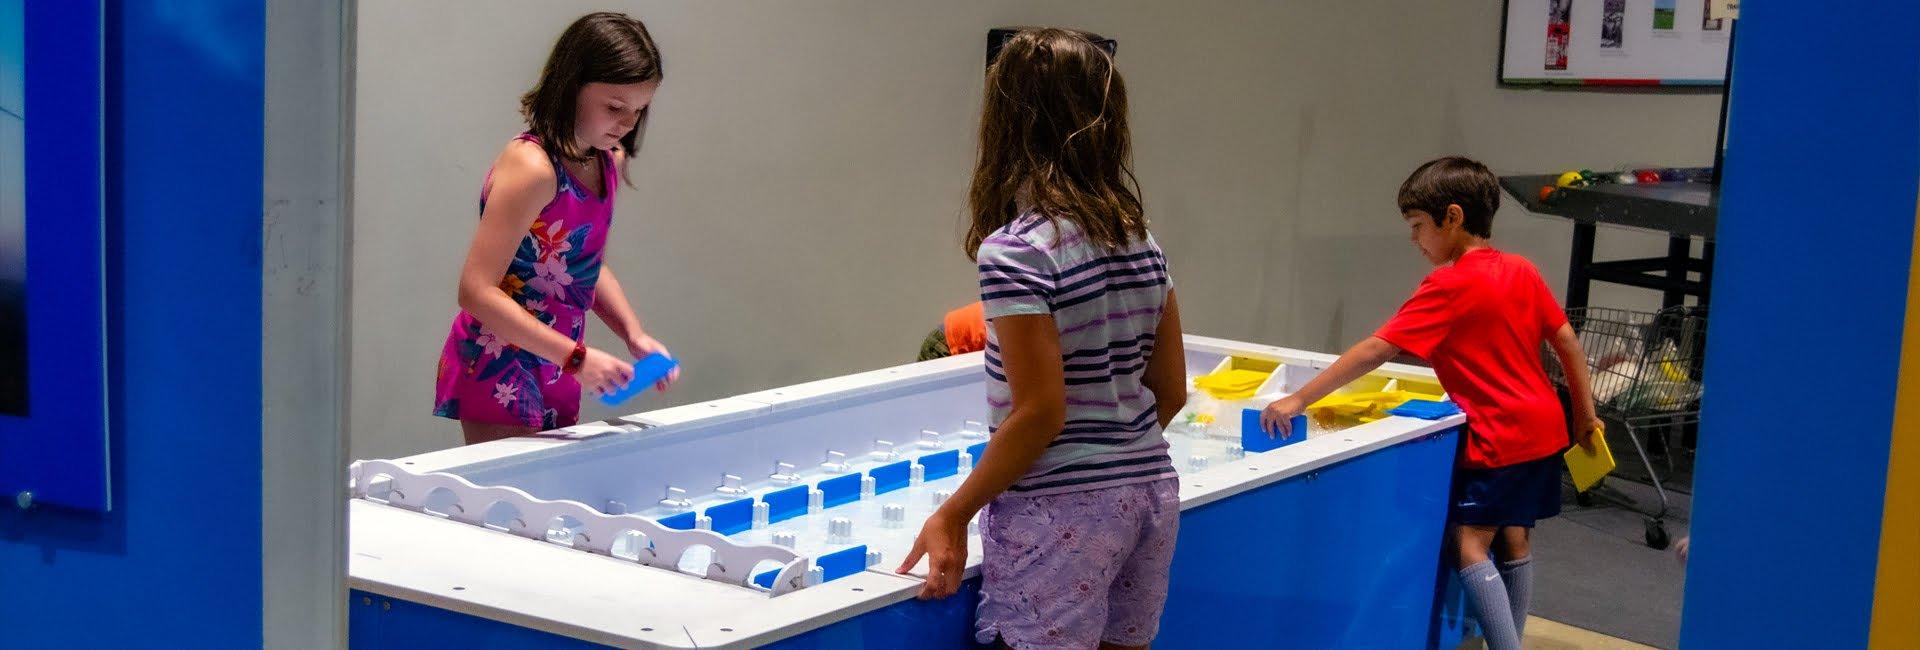 AFrey_Capital-Saratoga Region - miSci, Children interacting with exhibit